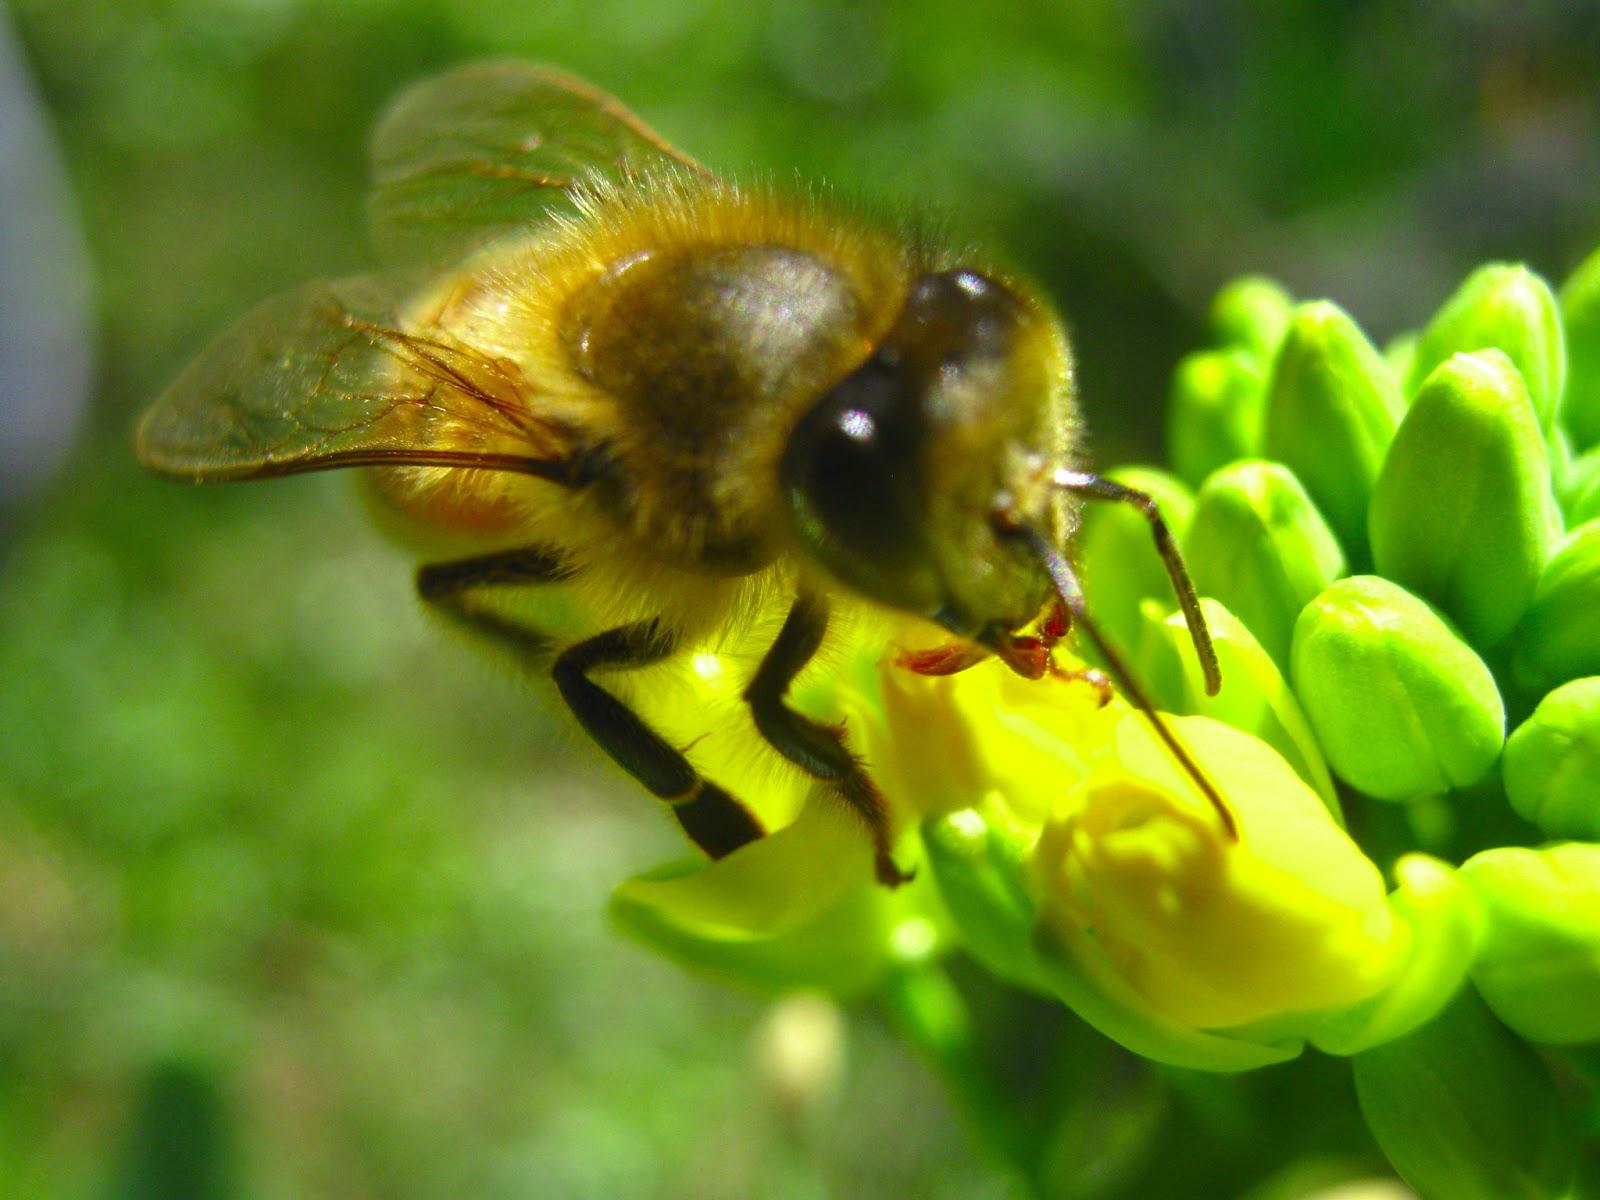 Anatomy of a Honey Bee